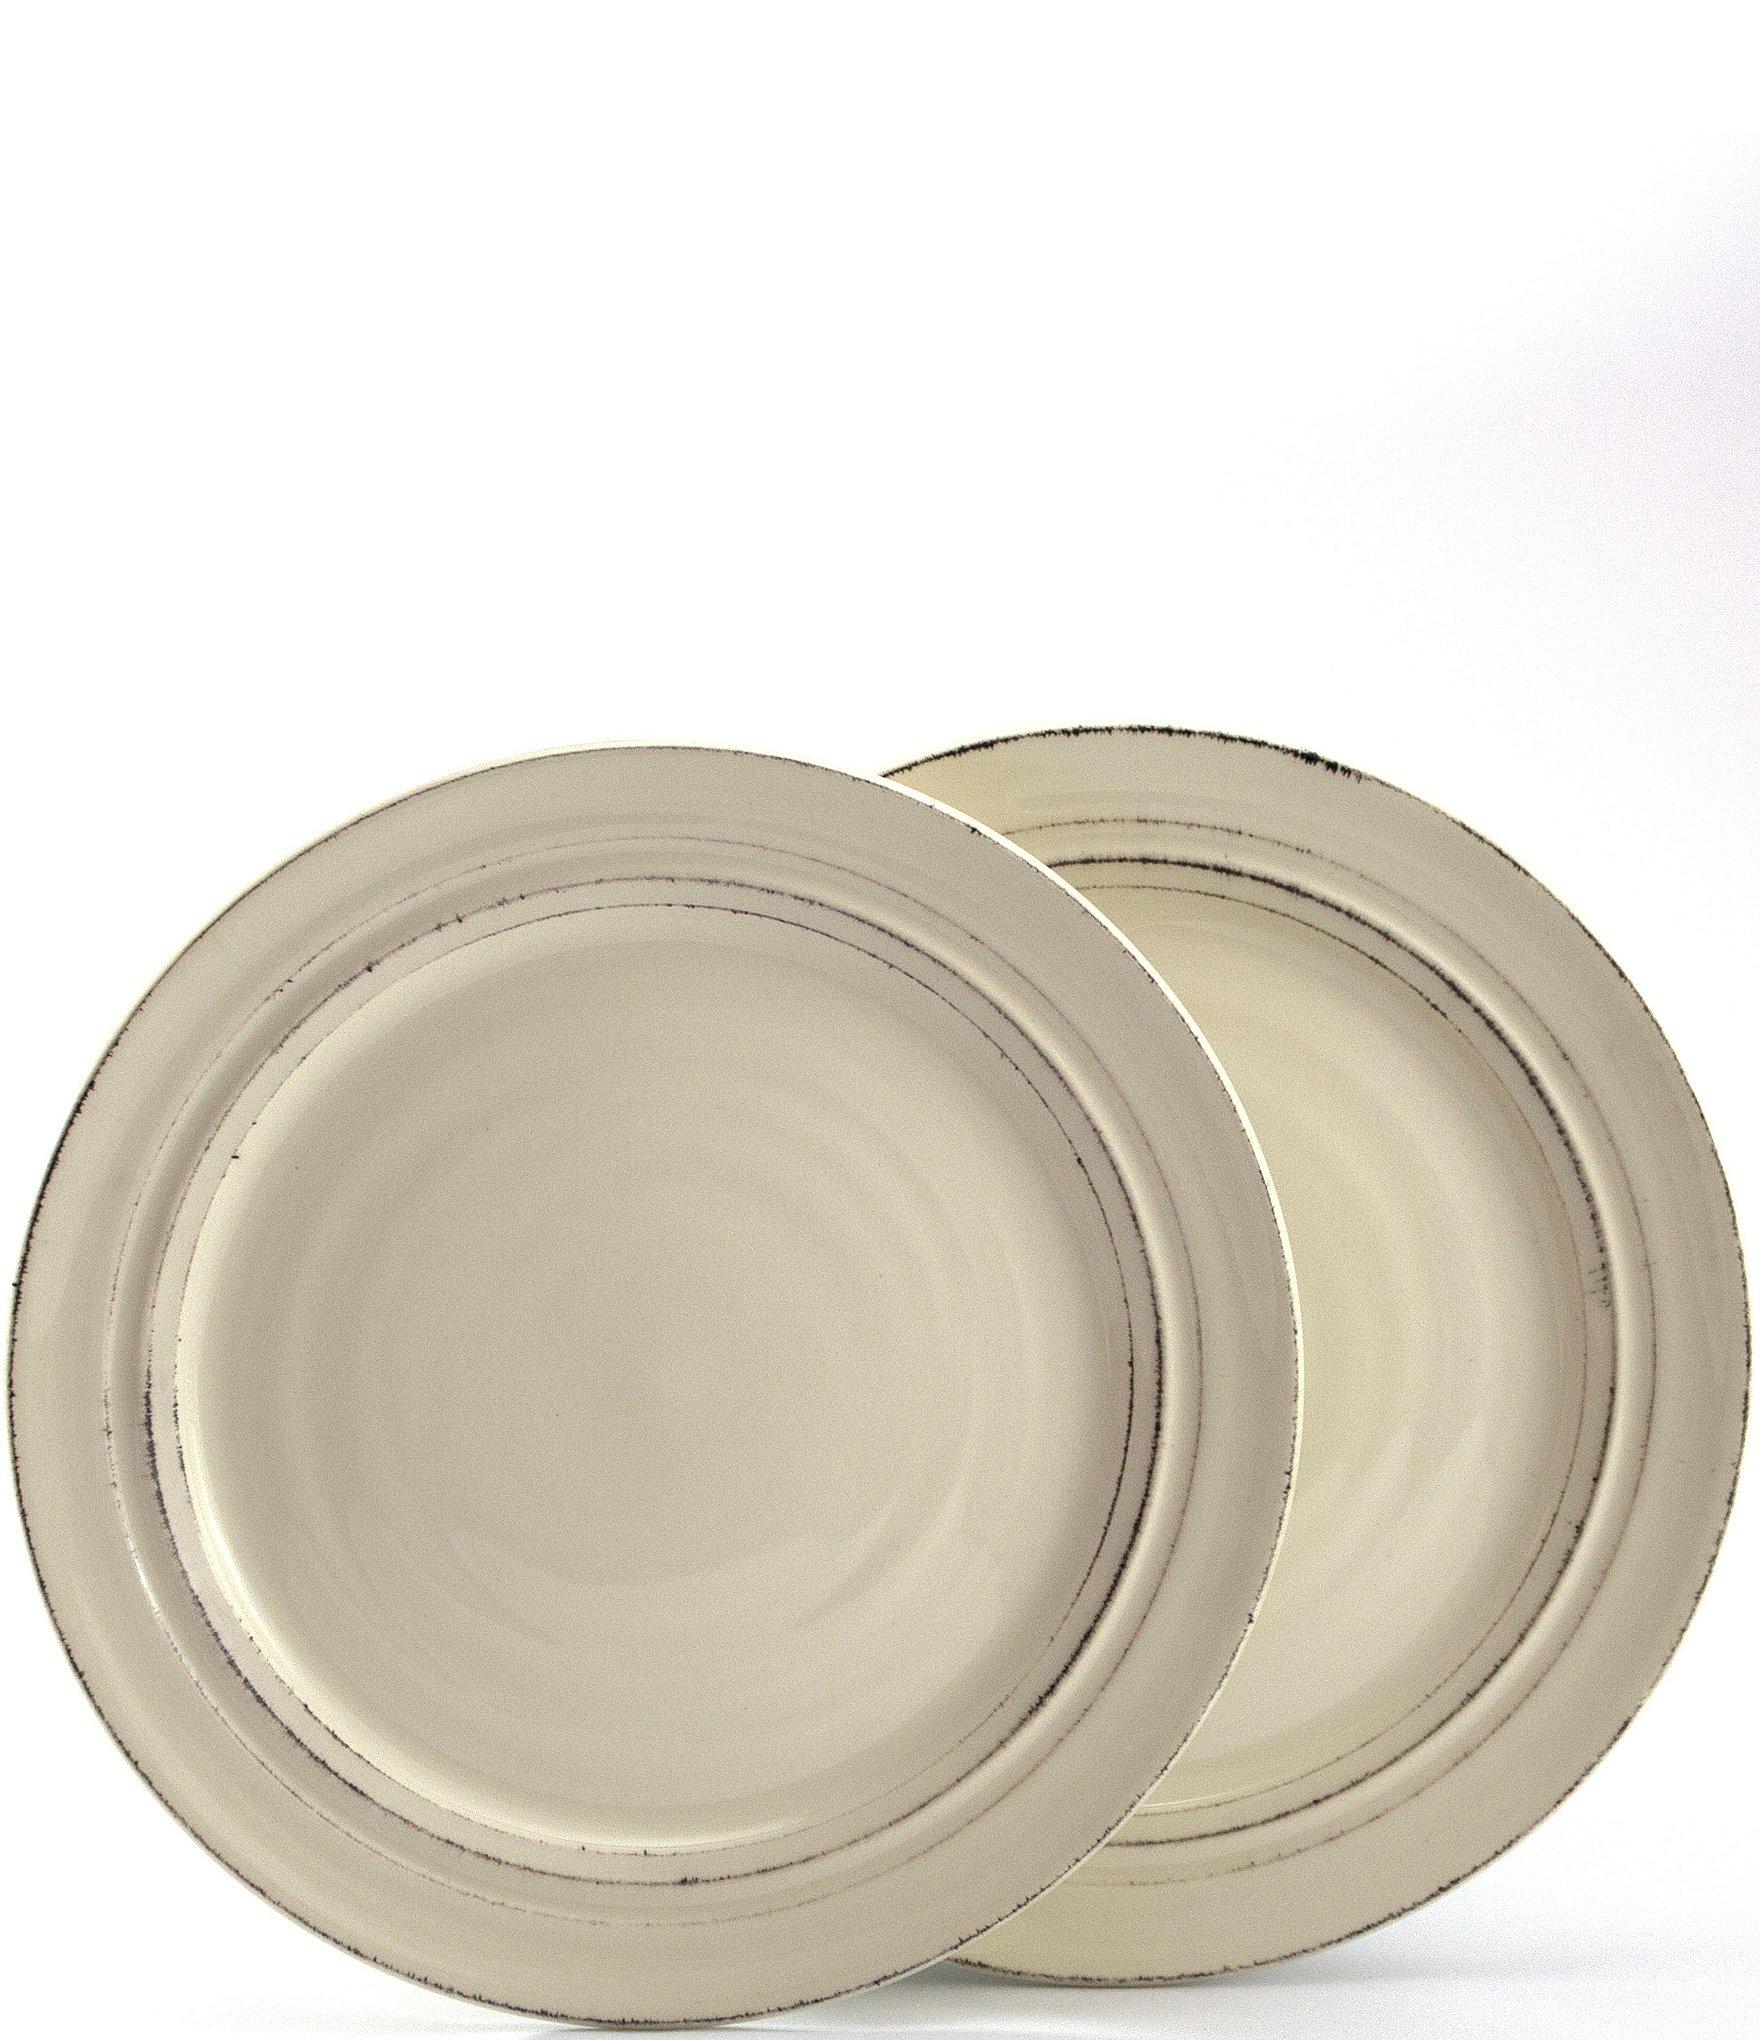 Noble Excellence Casual Everyday Dinnerware Plates  Dishes u0026 Sets | Dillards  sc 1 st  Dillardu0027s & Noble Excellence Casual Everyday Dinnerware: Plates  Dishes u0026 Sets ...